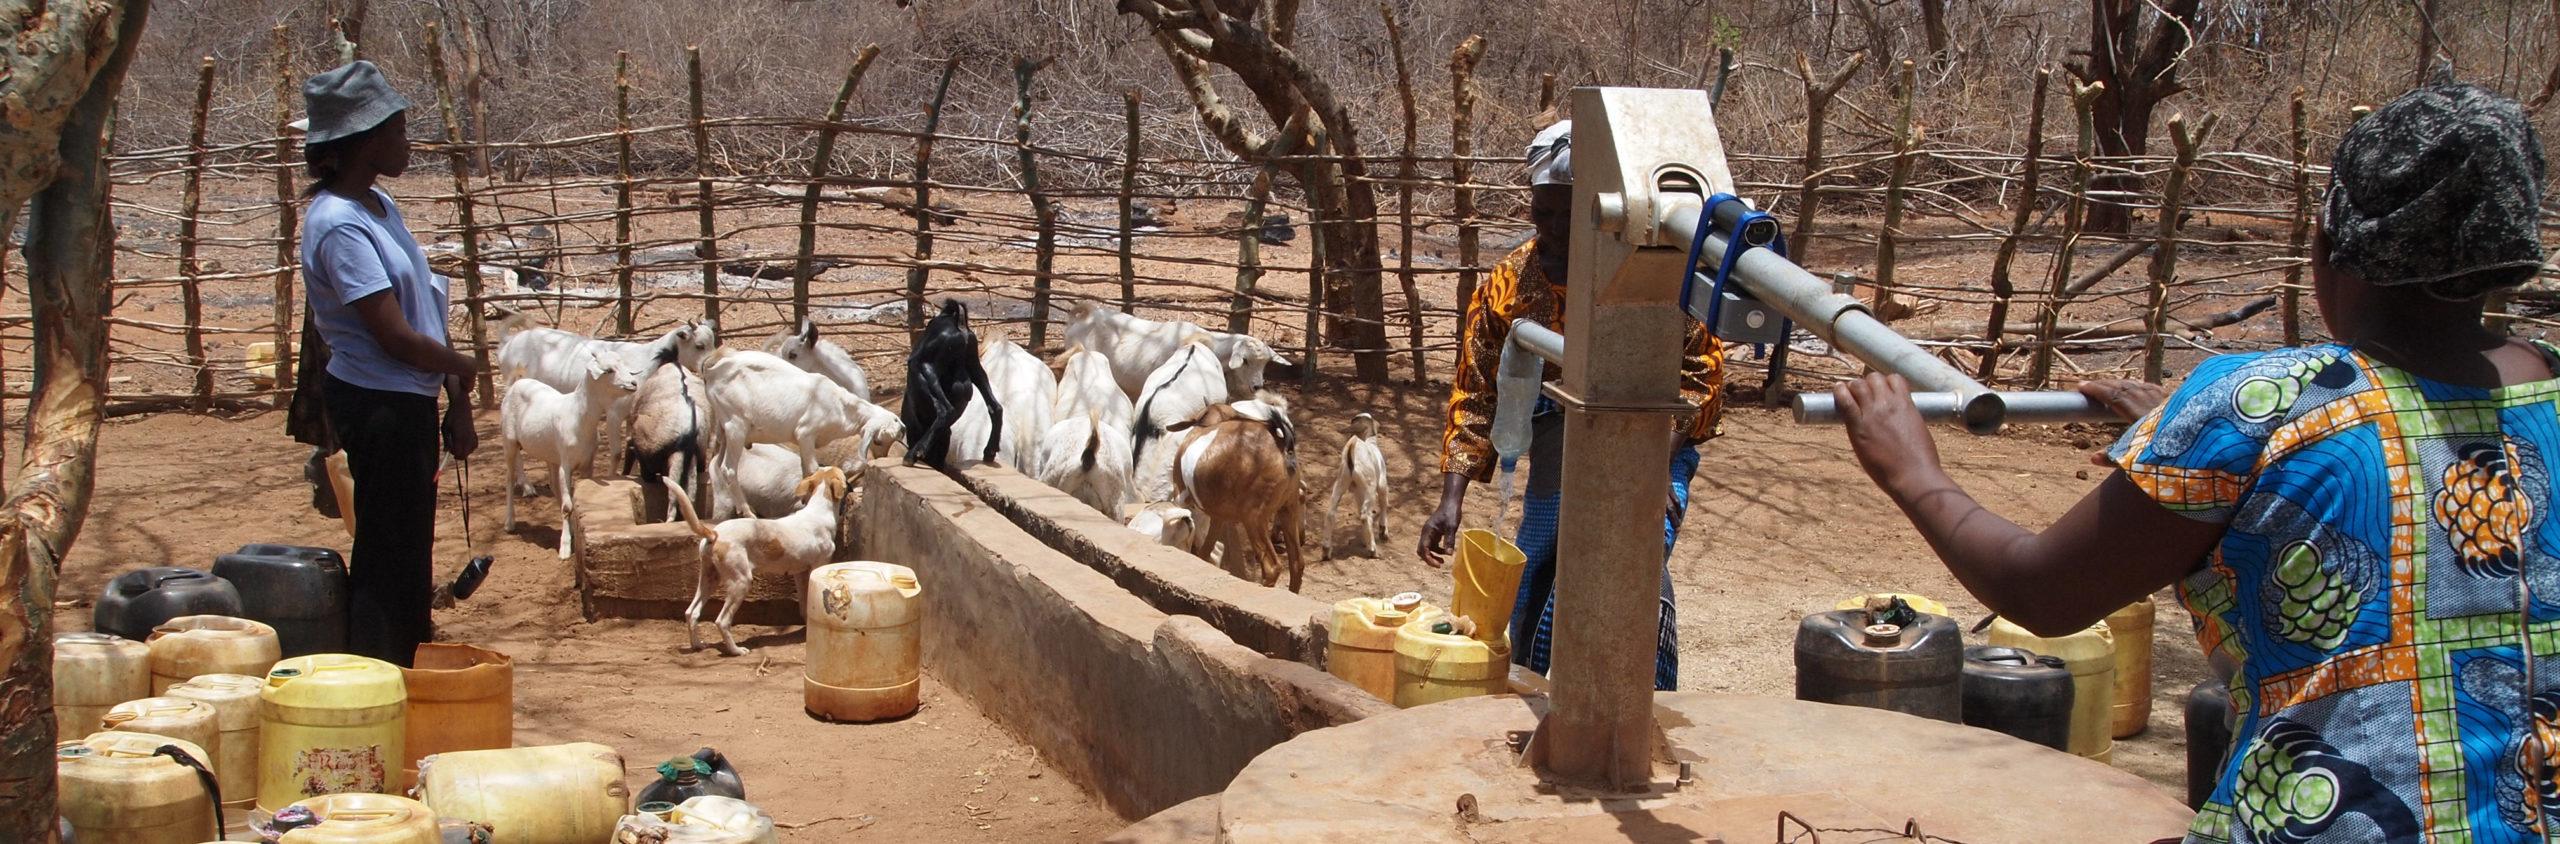 Woman collecting water at a hand pump in Kyuso, Kenya